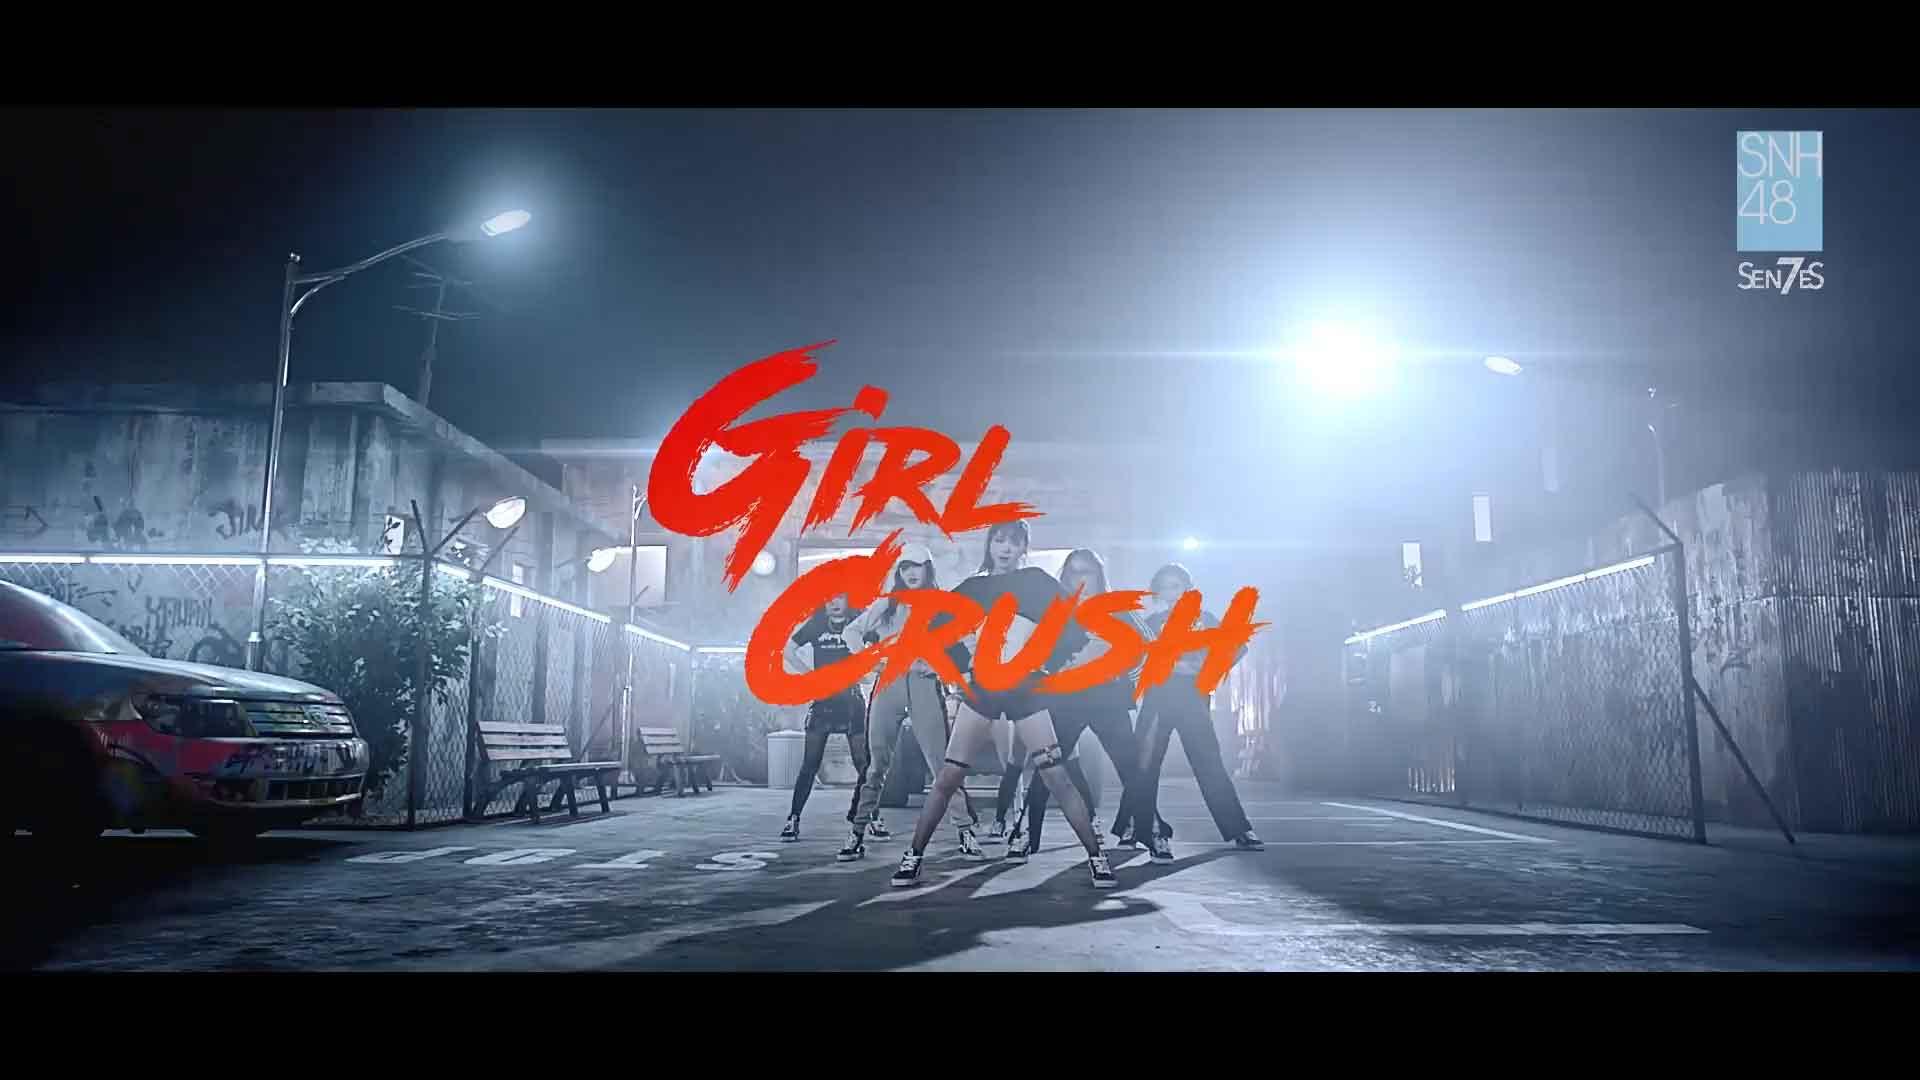 [1080P] SNH48_7SENSES - Girl Crush 官方HD-MV